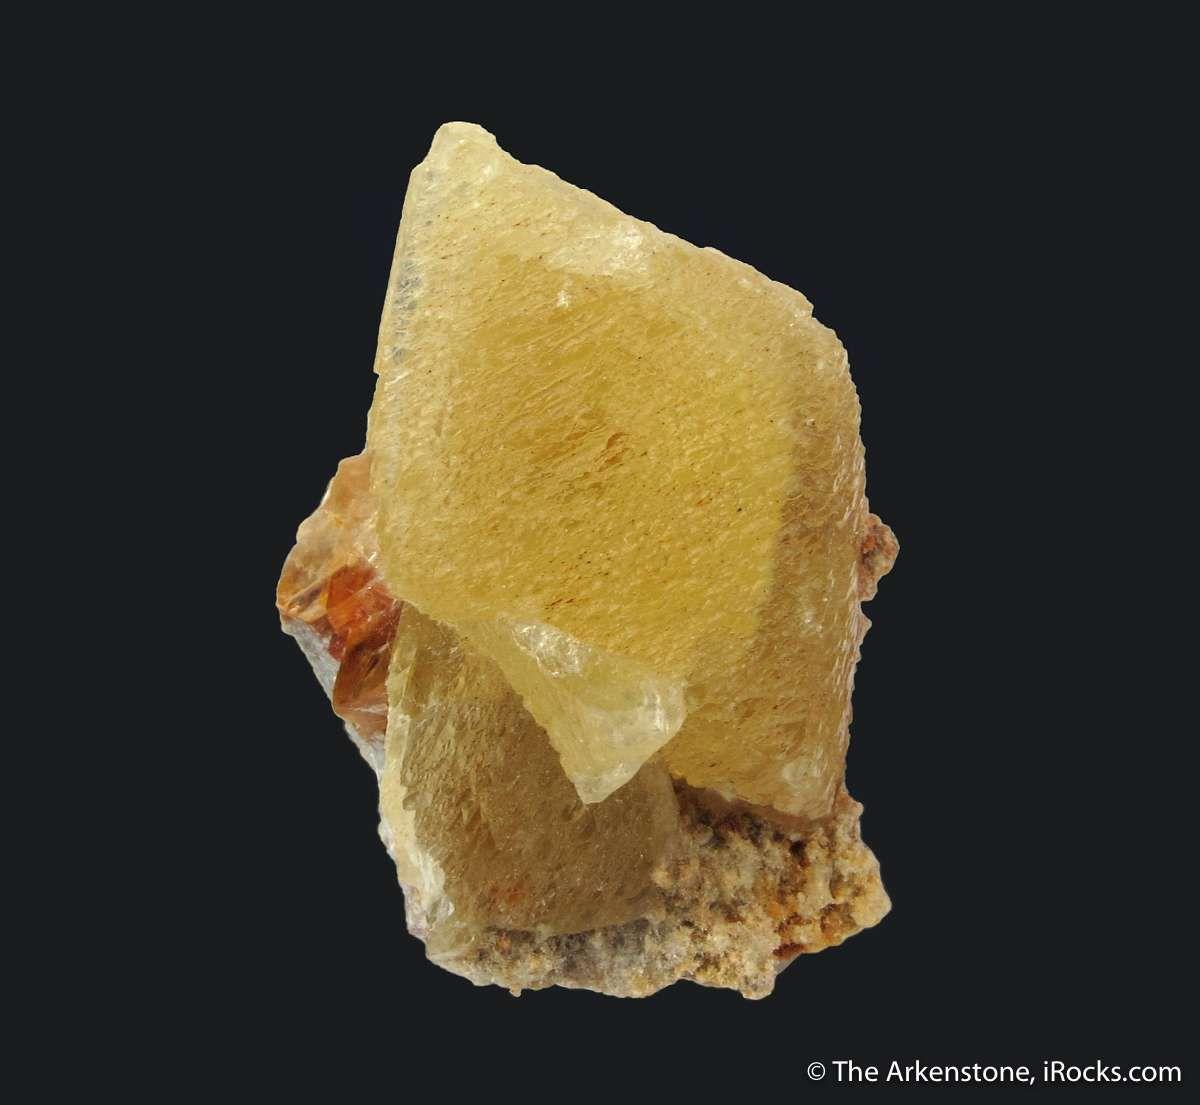 Namibia Smithsonite and Hemimorphite Specimen